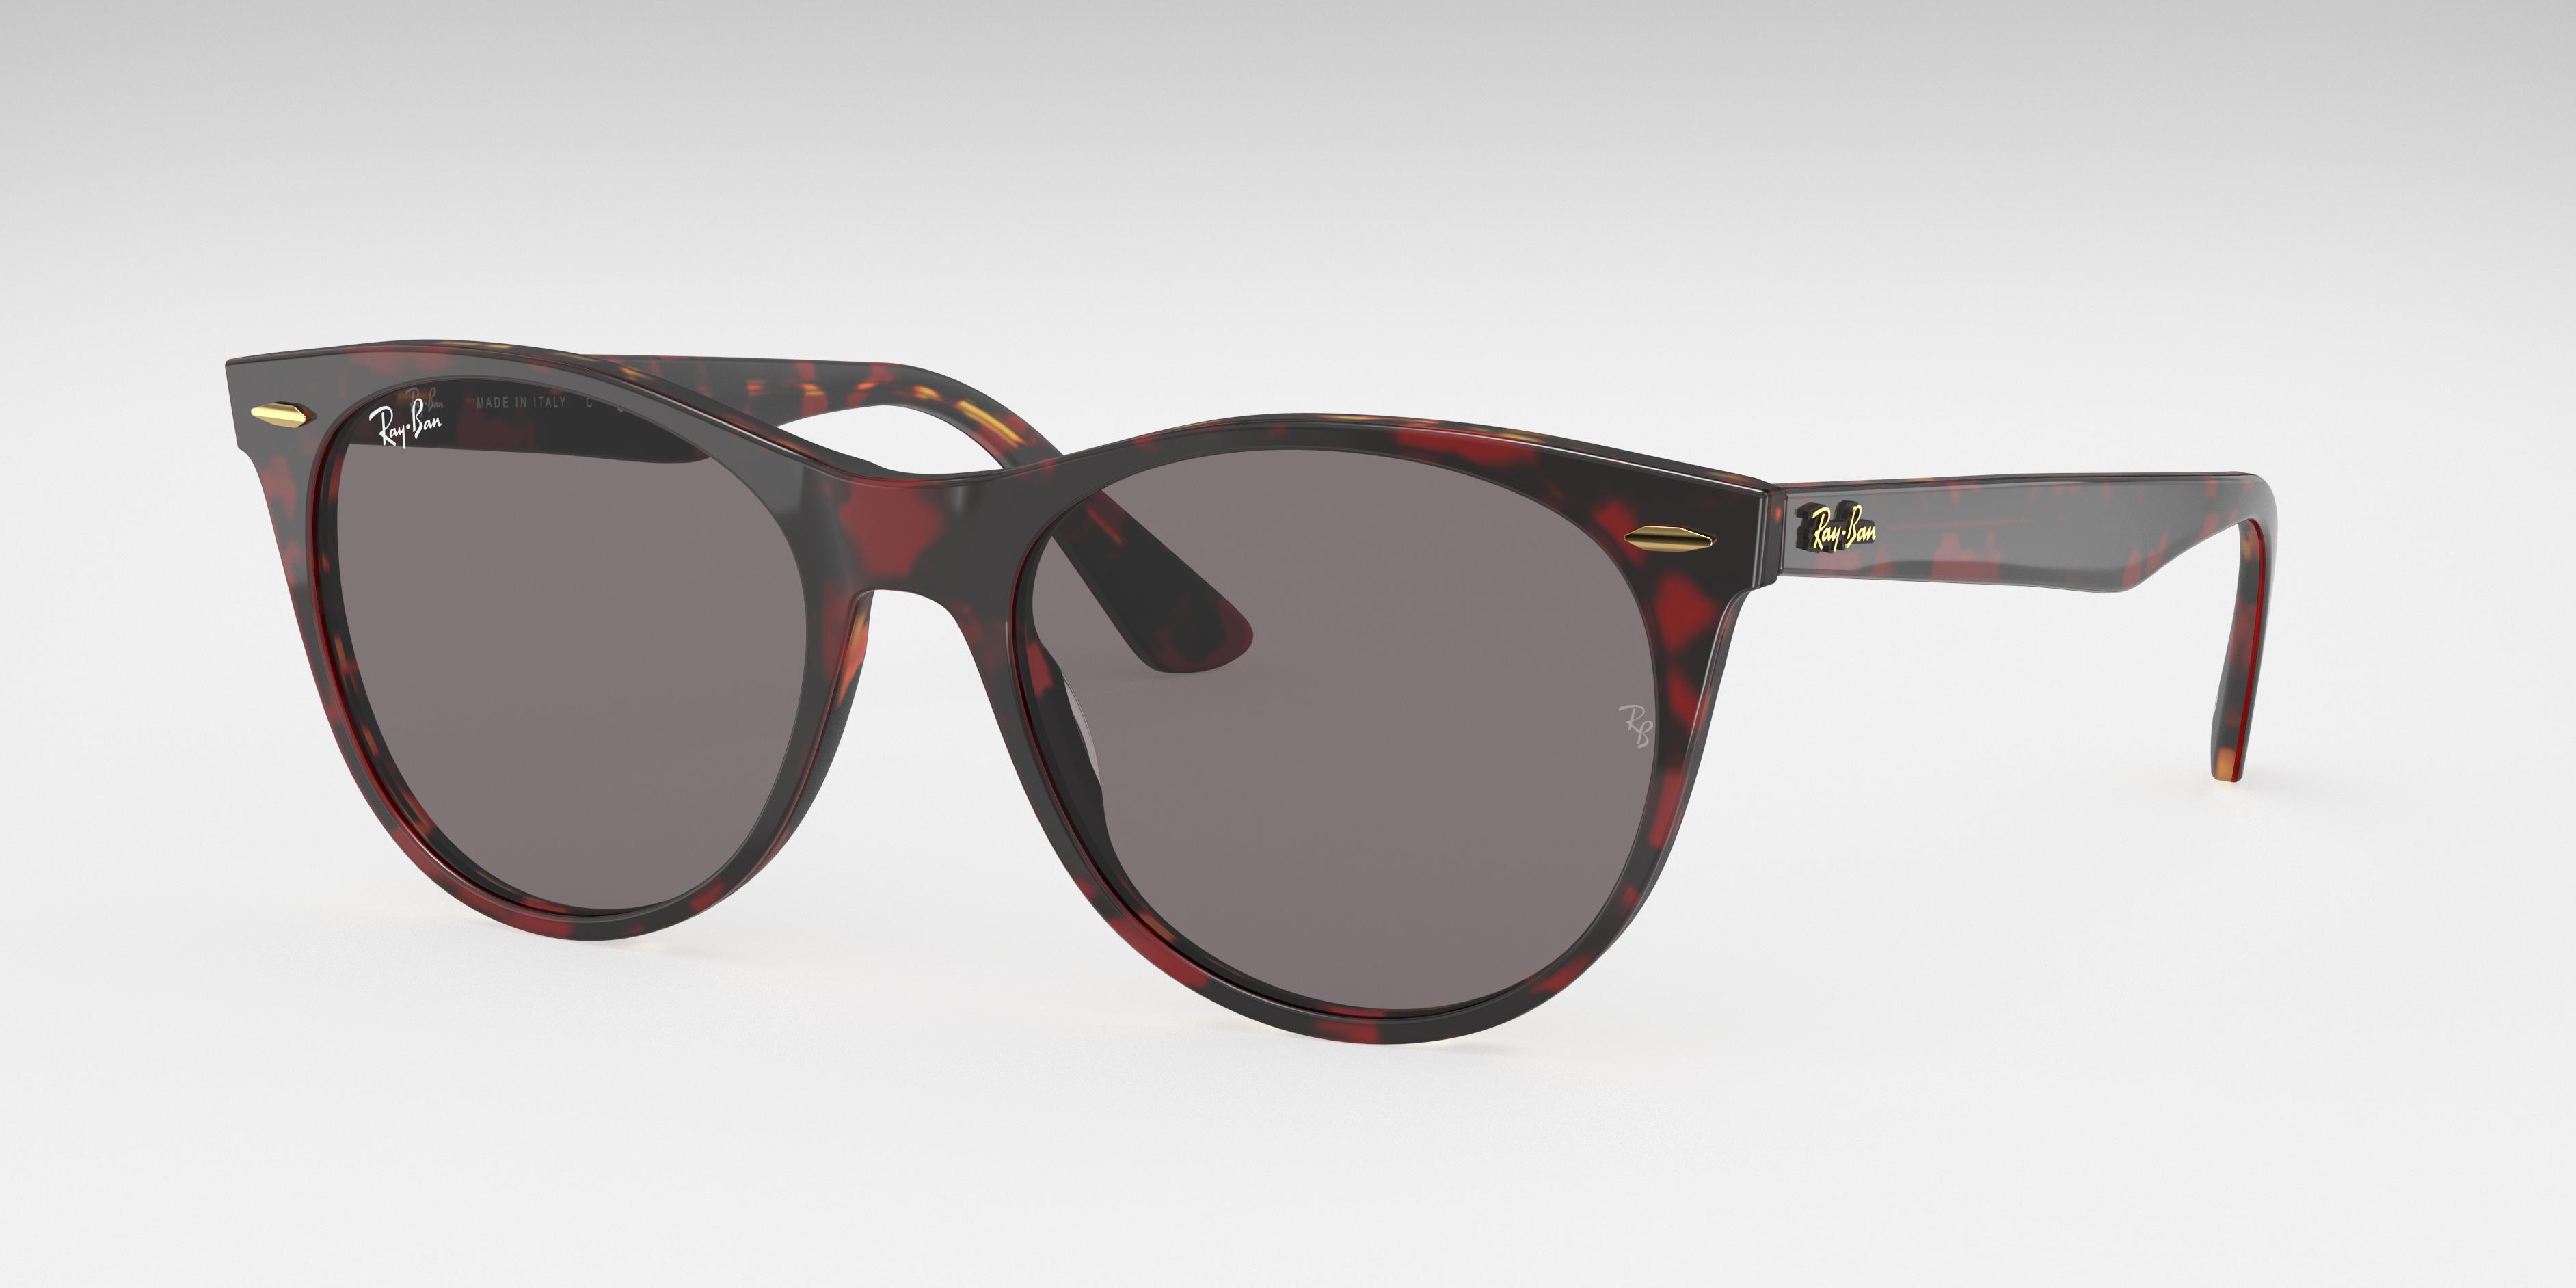 Ray-Ban Wayfarer II @collection Transparent Red, Grey Lenses - RB2185